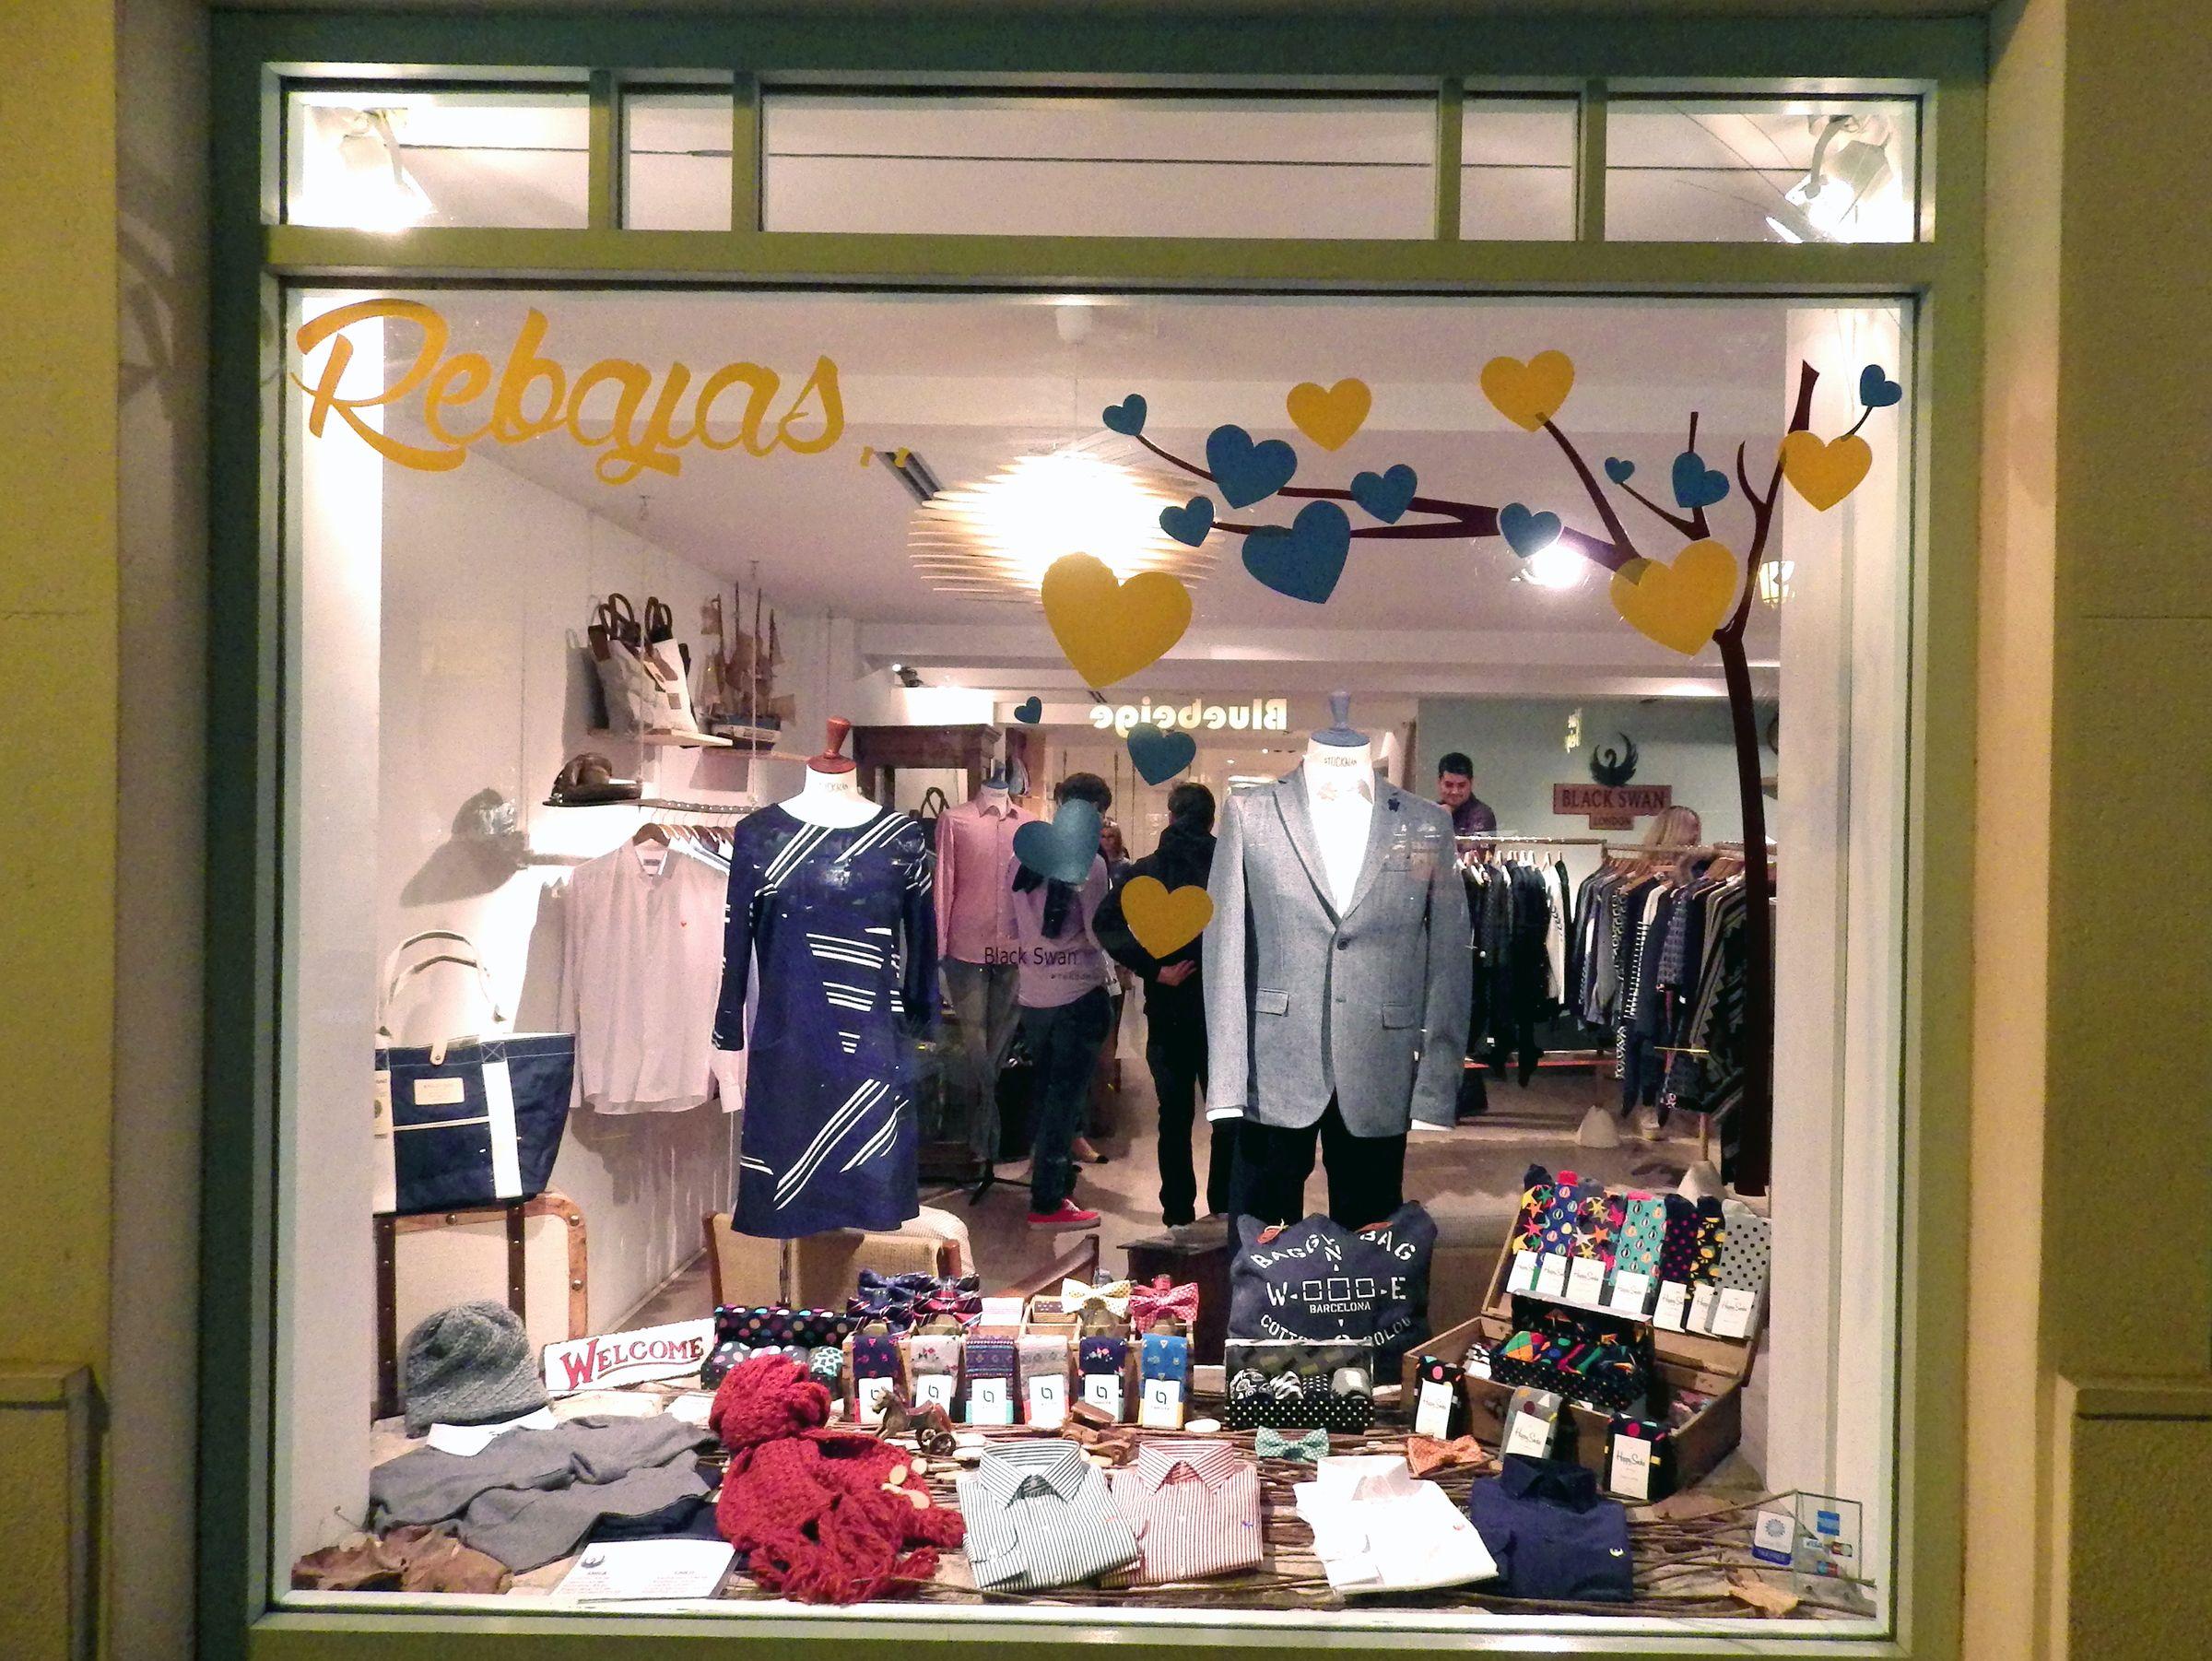 Nueva entrada en el blog! New post in the blog! http://bit.ly/2fjBI3K #blackswanlondon #blackswanparty #inlovewithbs #fashion #fashionlooks #fashionmen #moda #preppy #shopping #fashioninspo #tiendasconencanto #giftideas #november #fall2016 #otoño2016